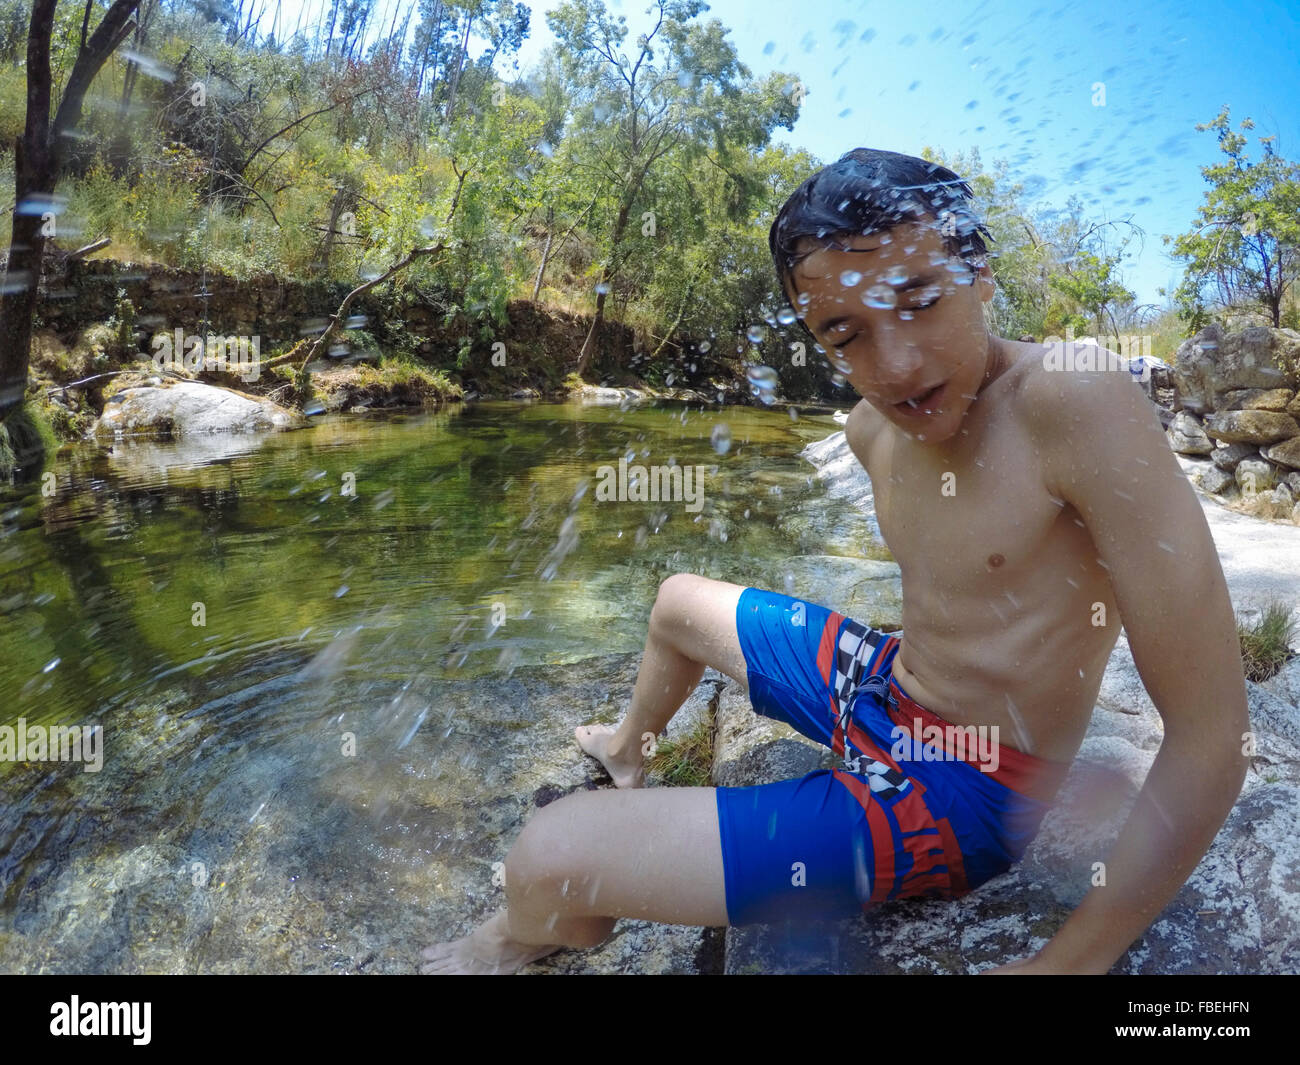 Shirtless jungen mit Augen geschlossen Spritzwasser im Fluss Stockbild